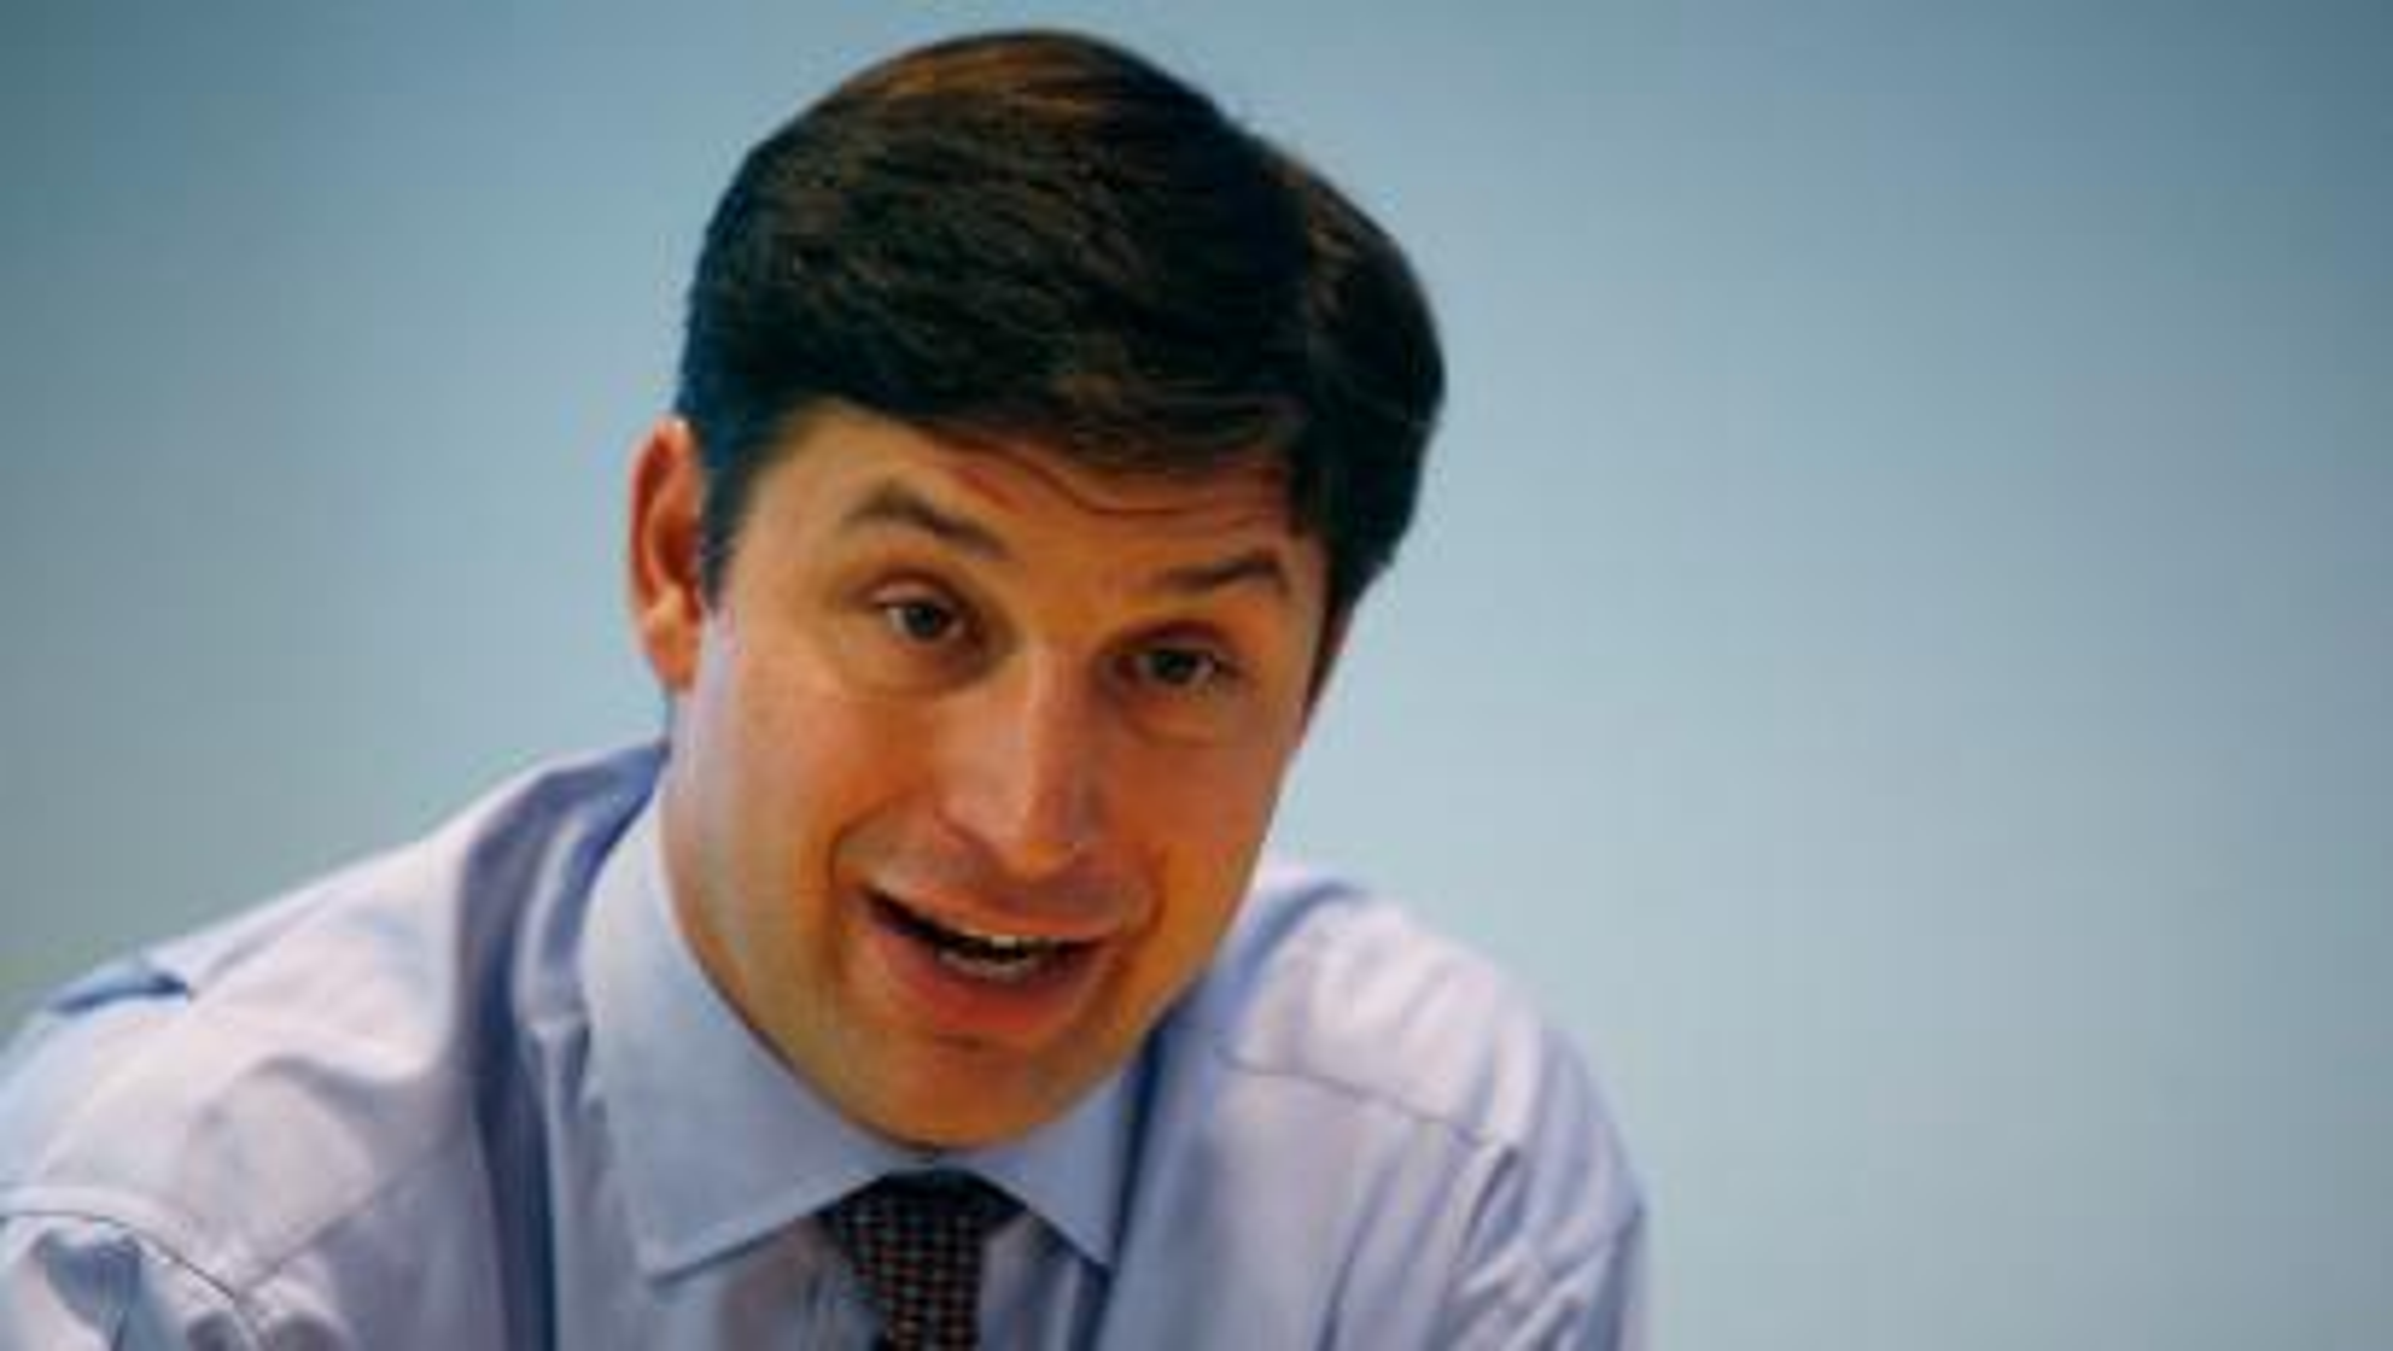 Goldman Sachs Internet and media banker, Anthony Noto,